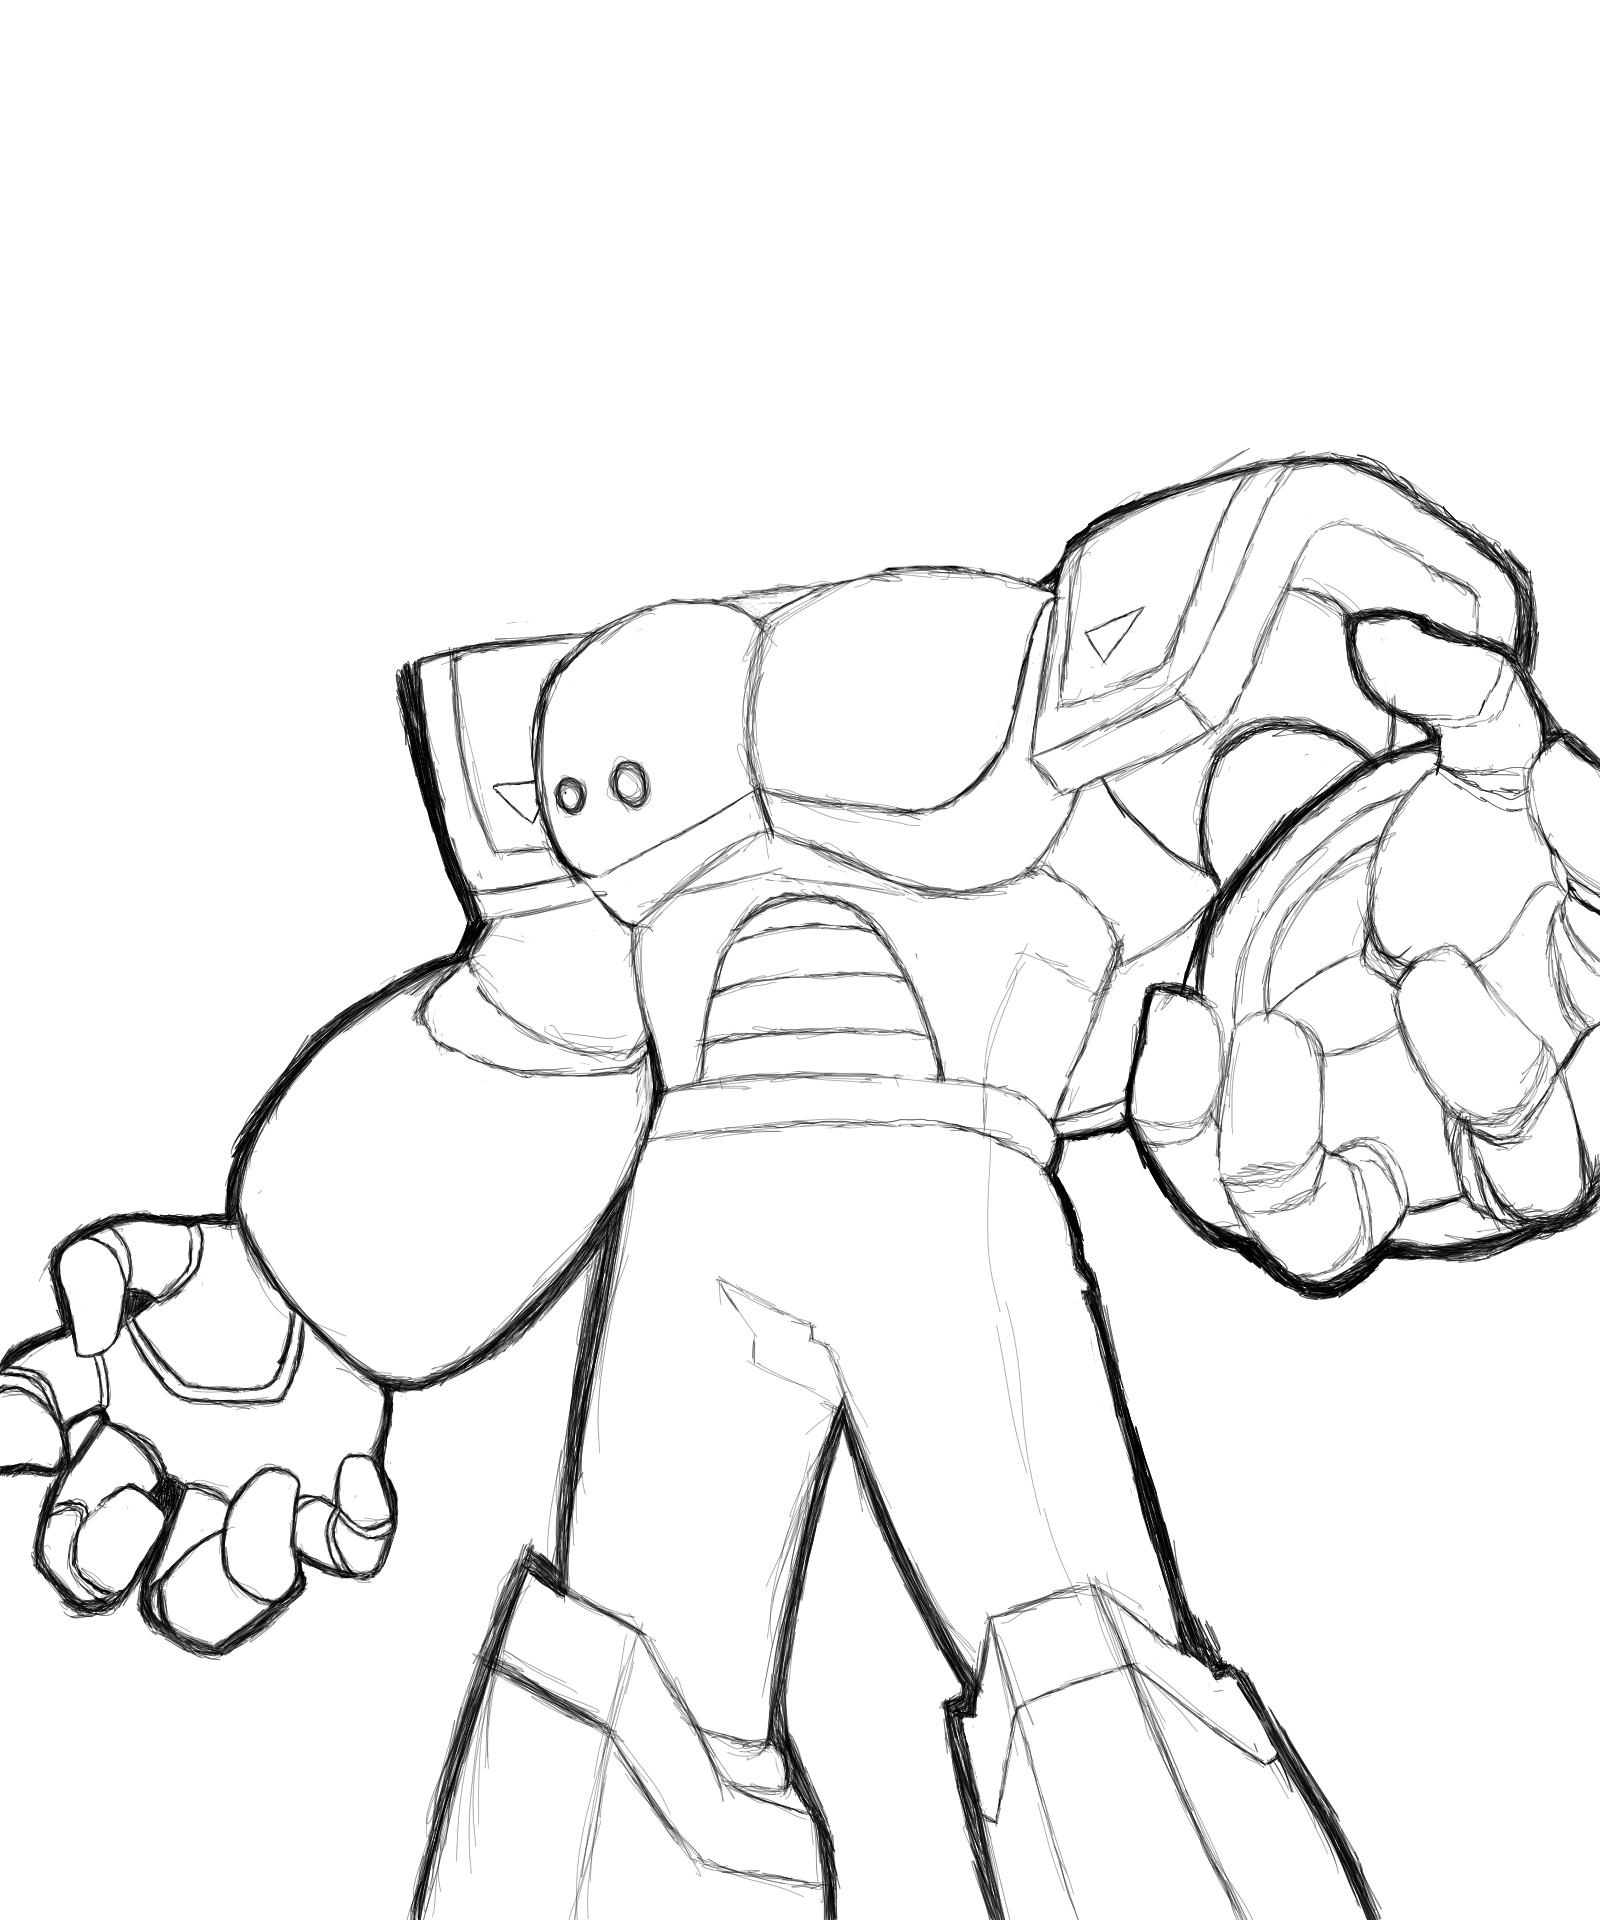 guess who! by Megamanzero12